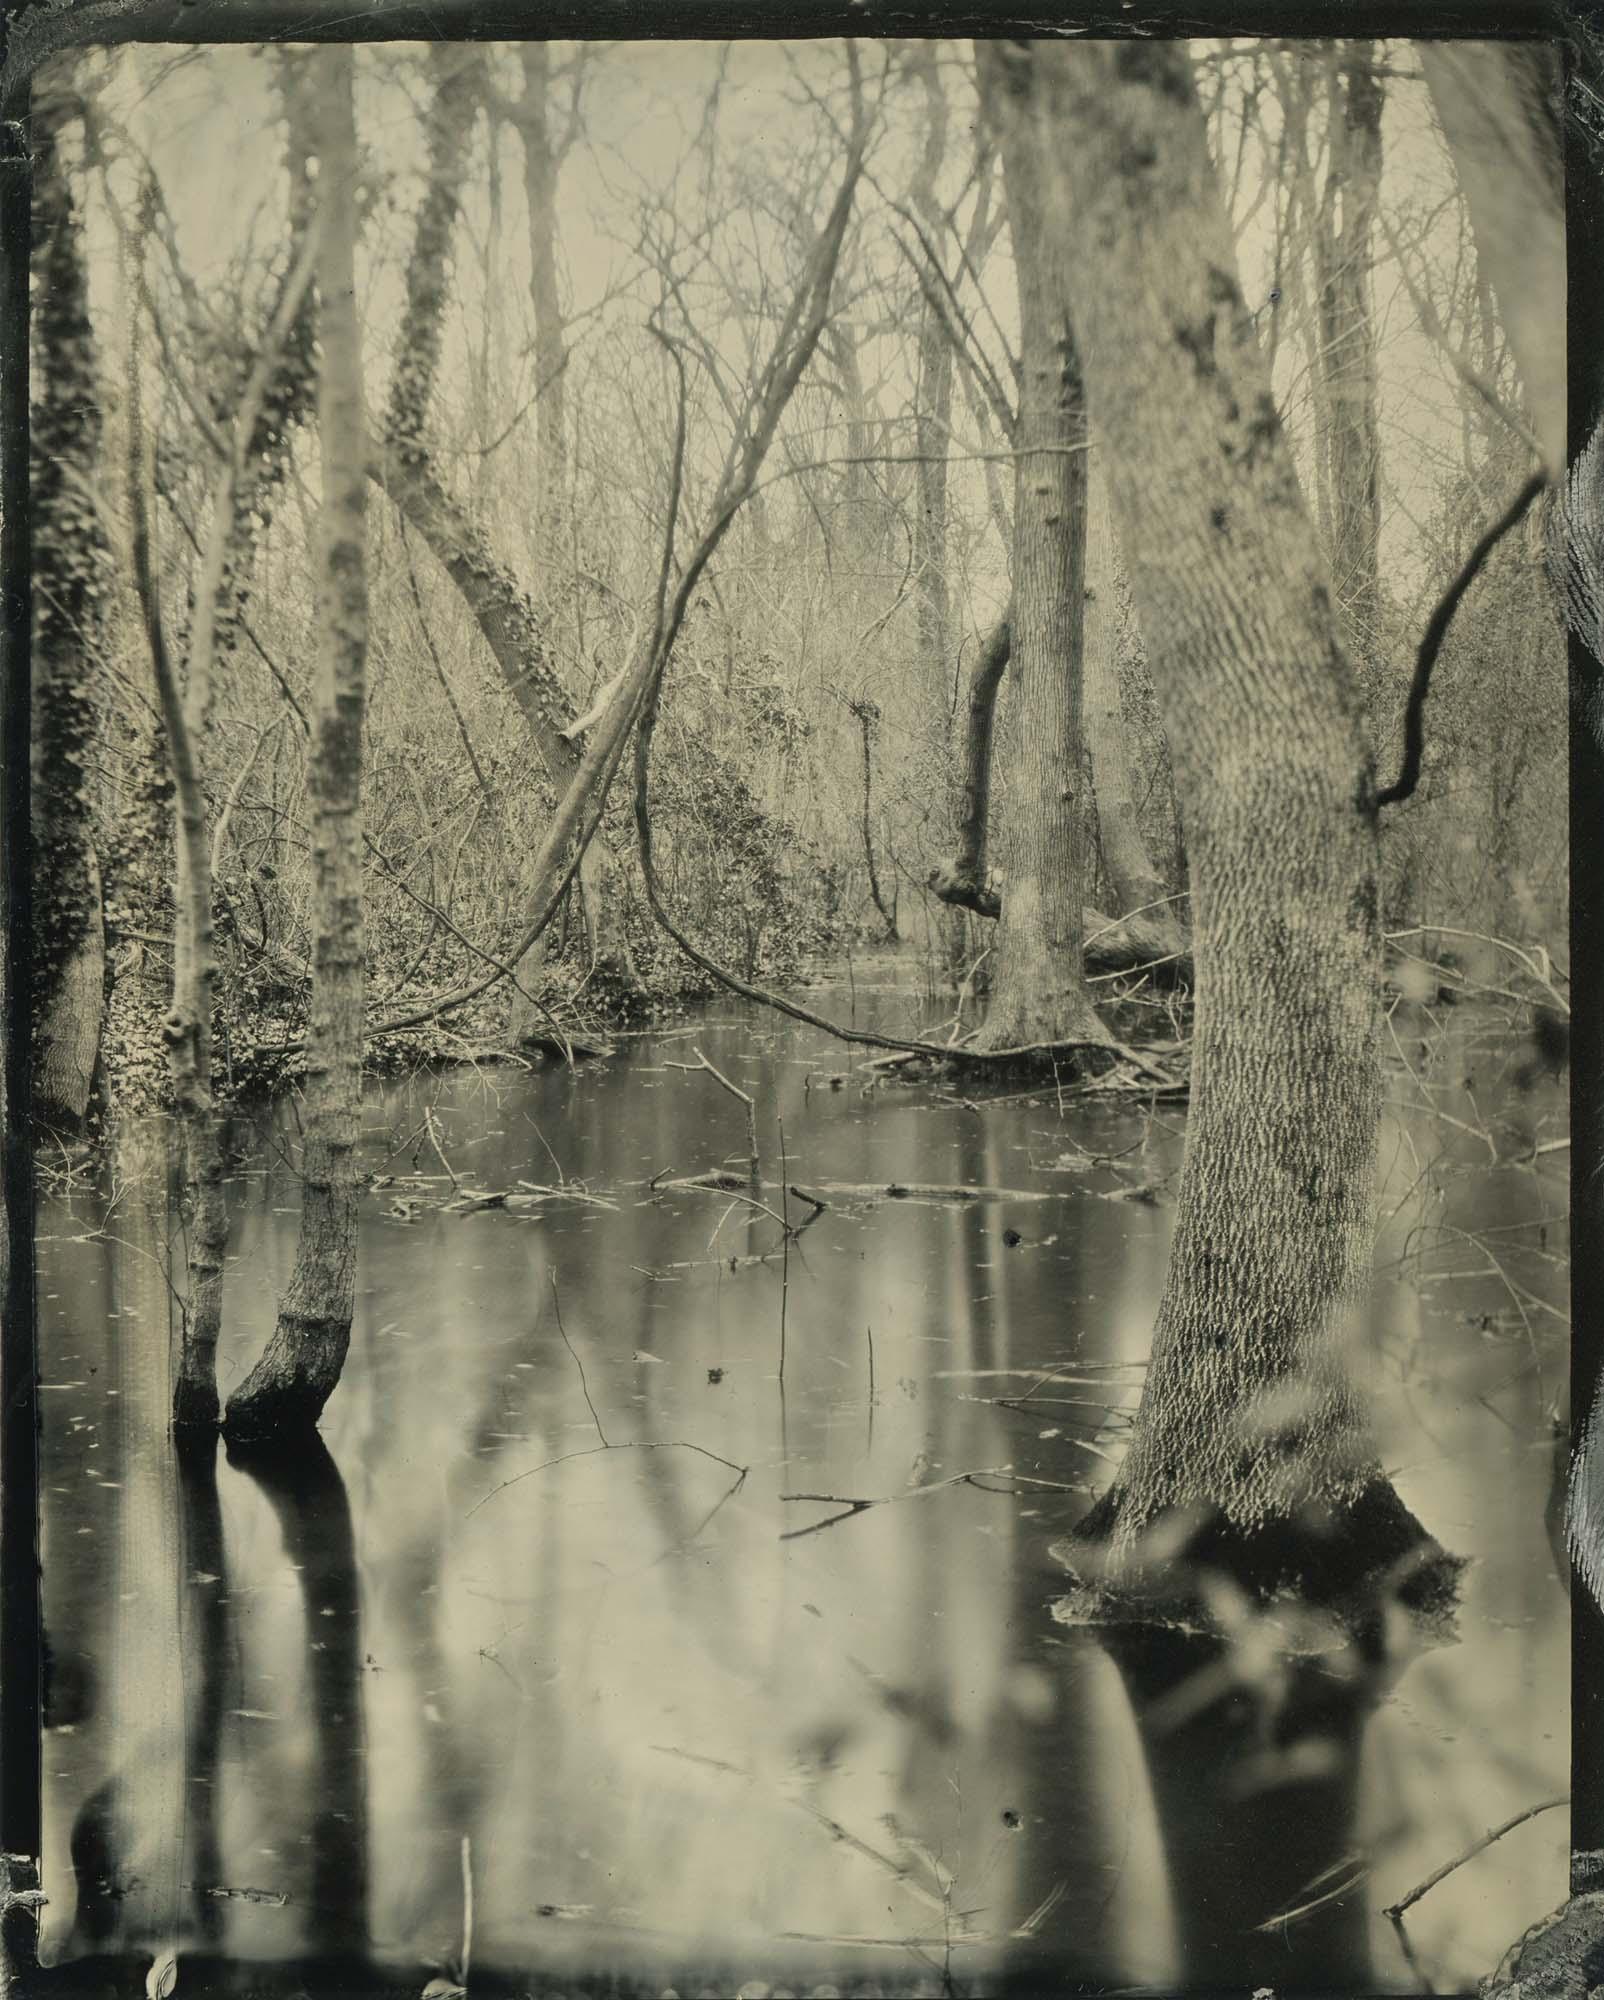 Title : Untitled Swamp By: Emily White    www.emwhitephoto.com